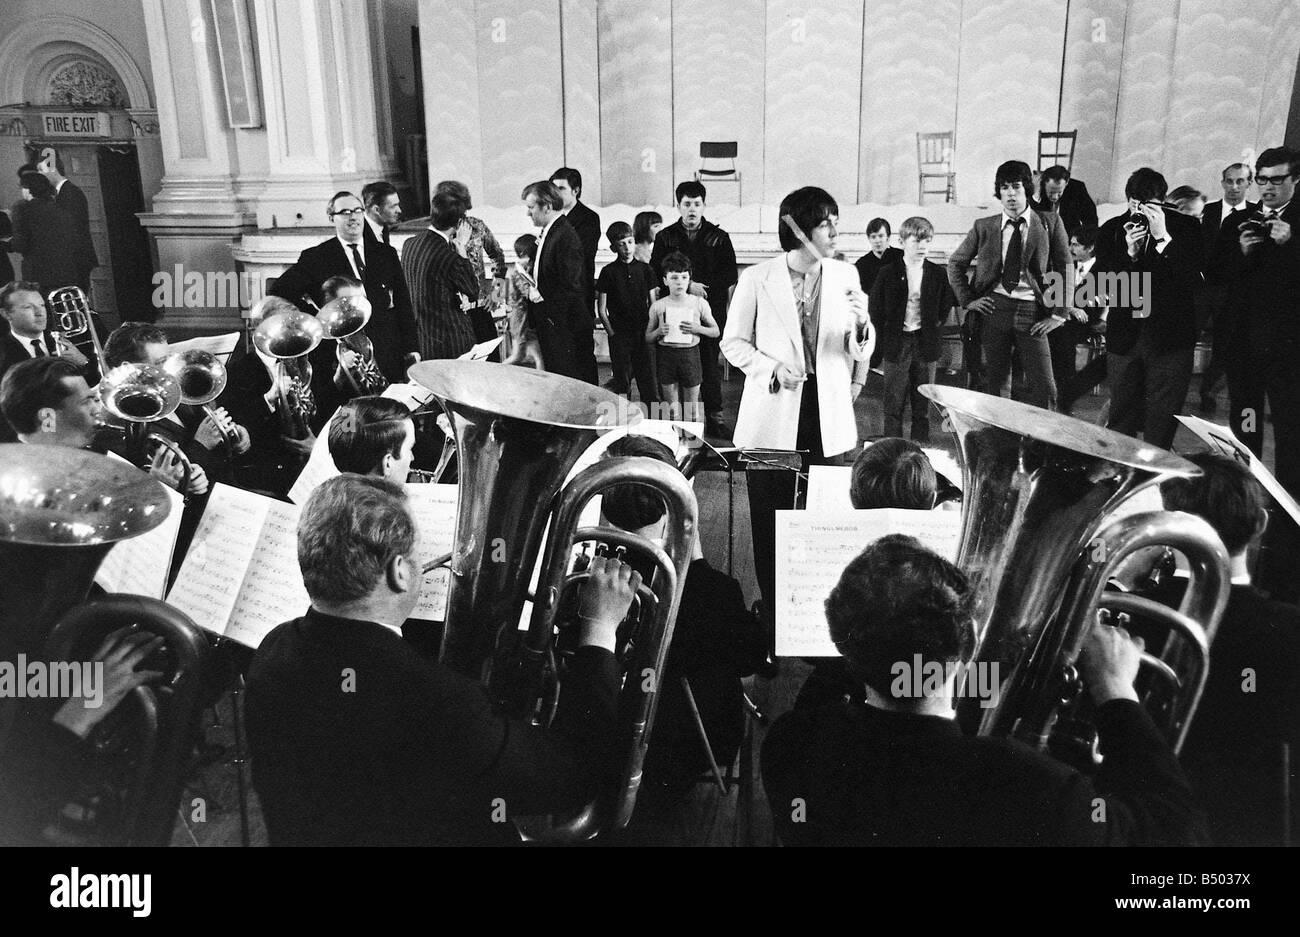 Beatles files 1968 Paul McCartney conducts the Black Dyke